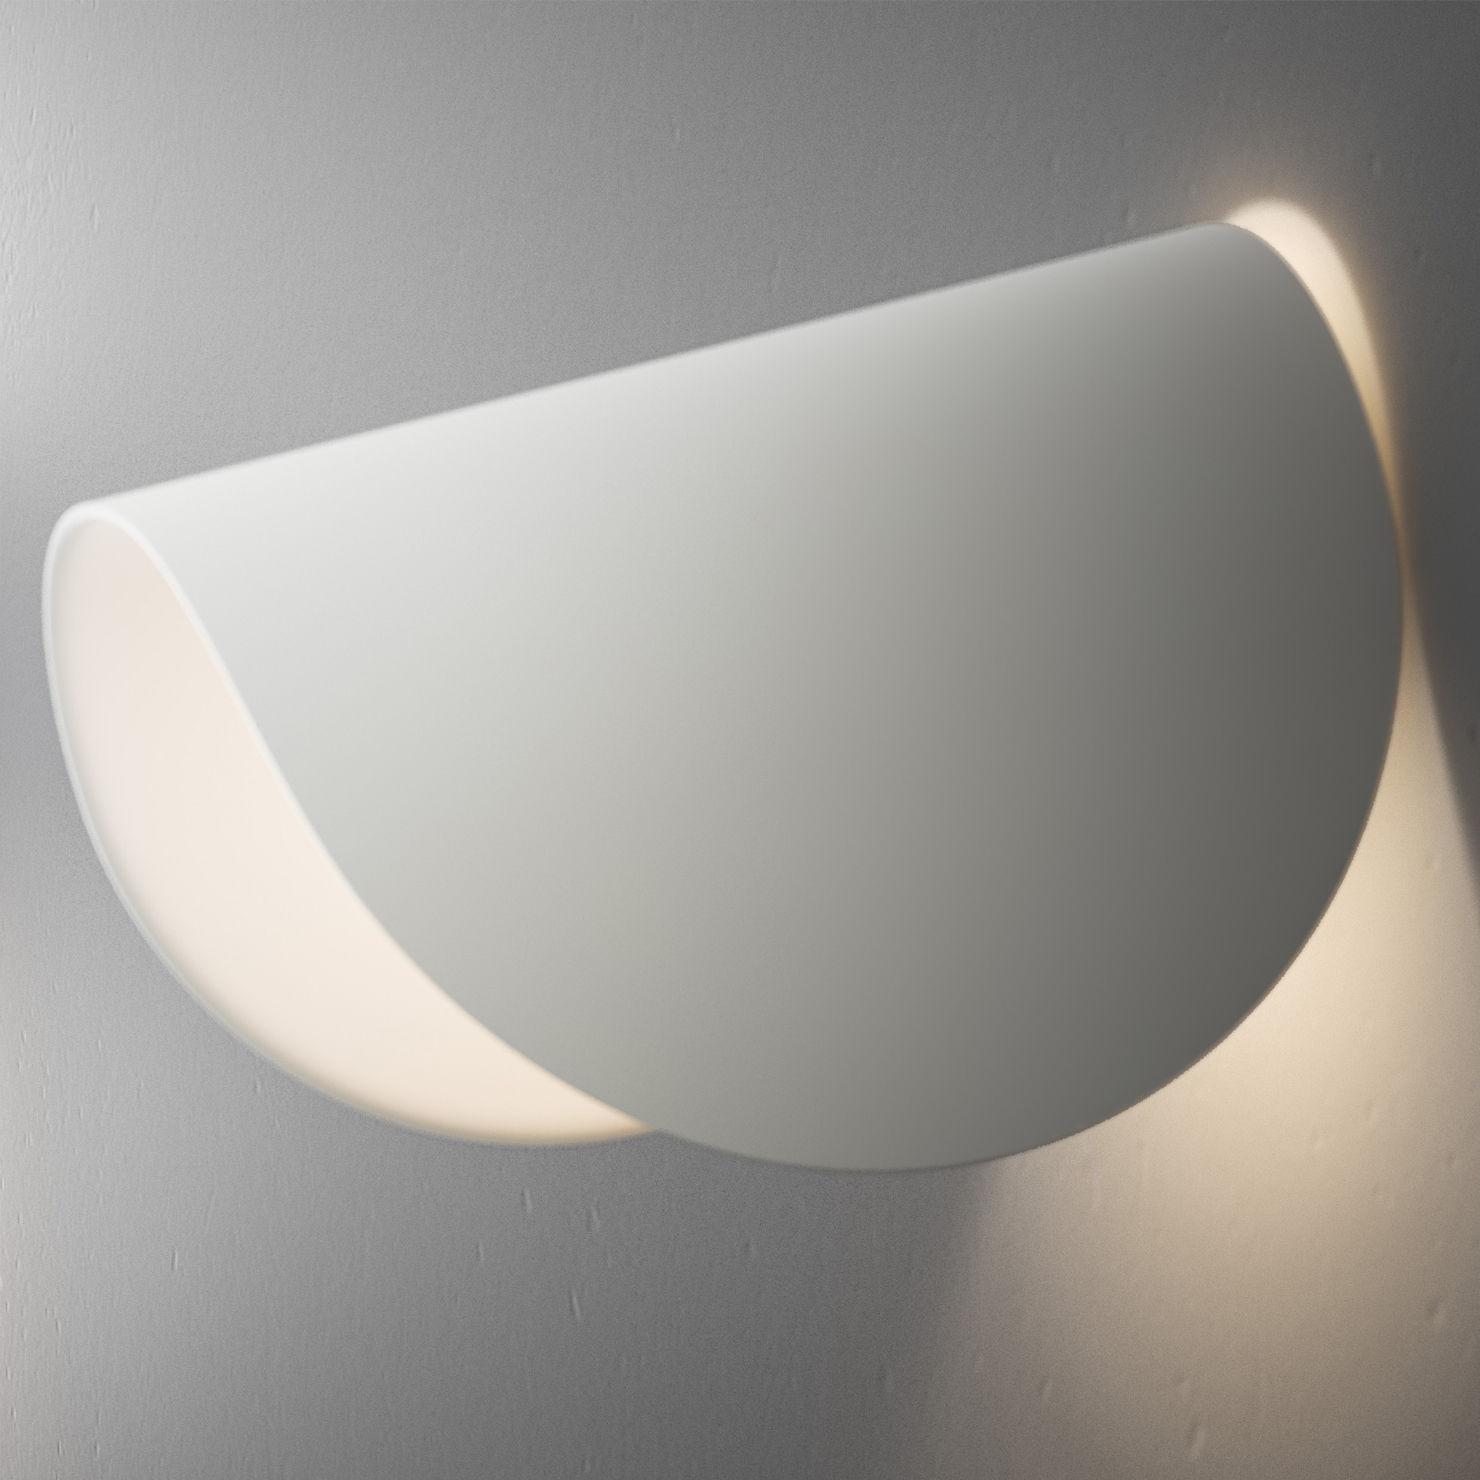 applique io led orientable blanc fontana arte made in design. Black Bedroom Furniture Sets. Home Design Ideas